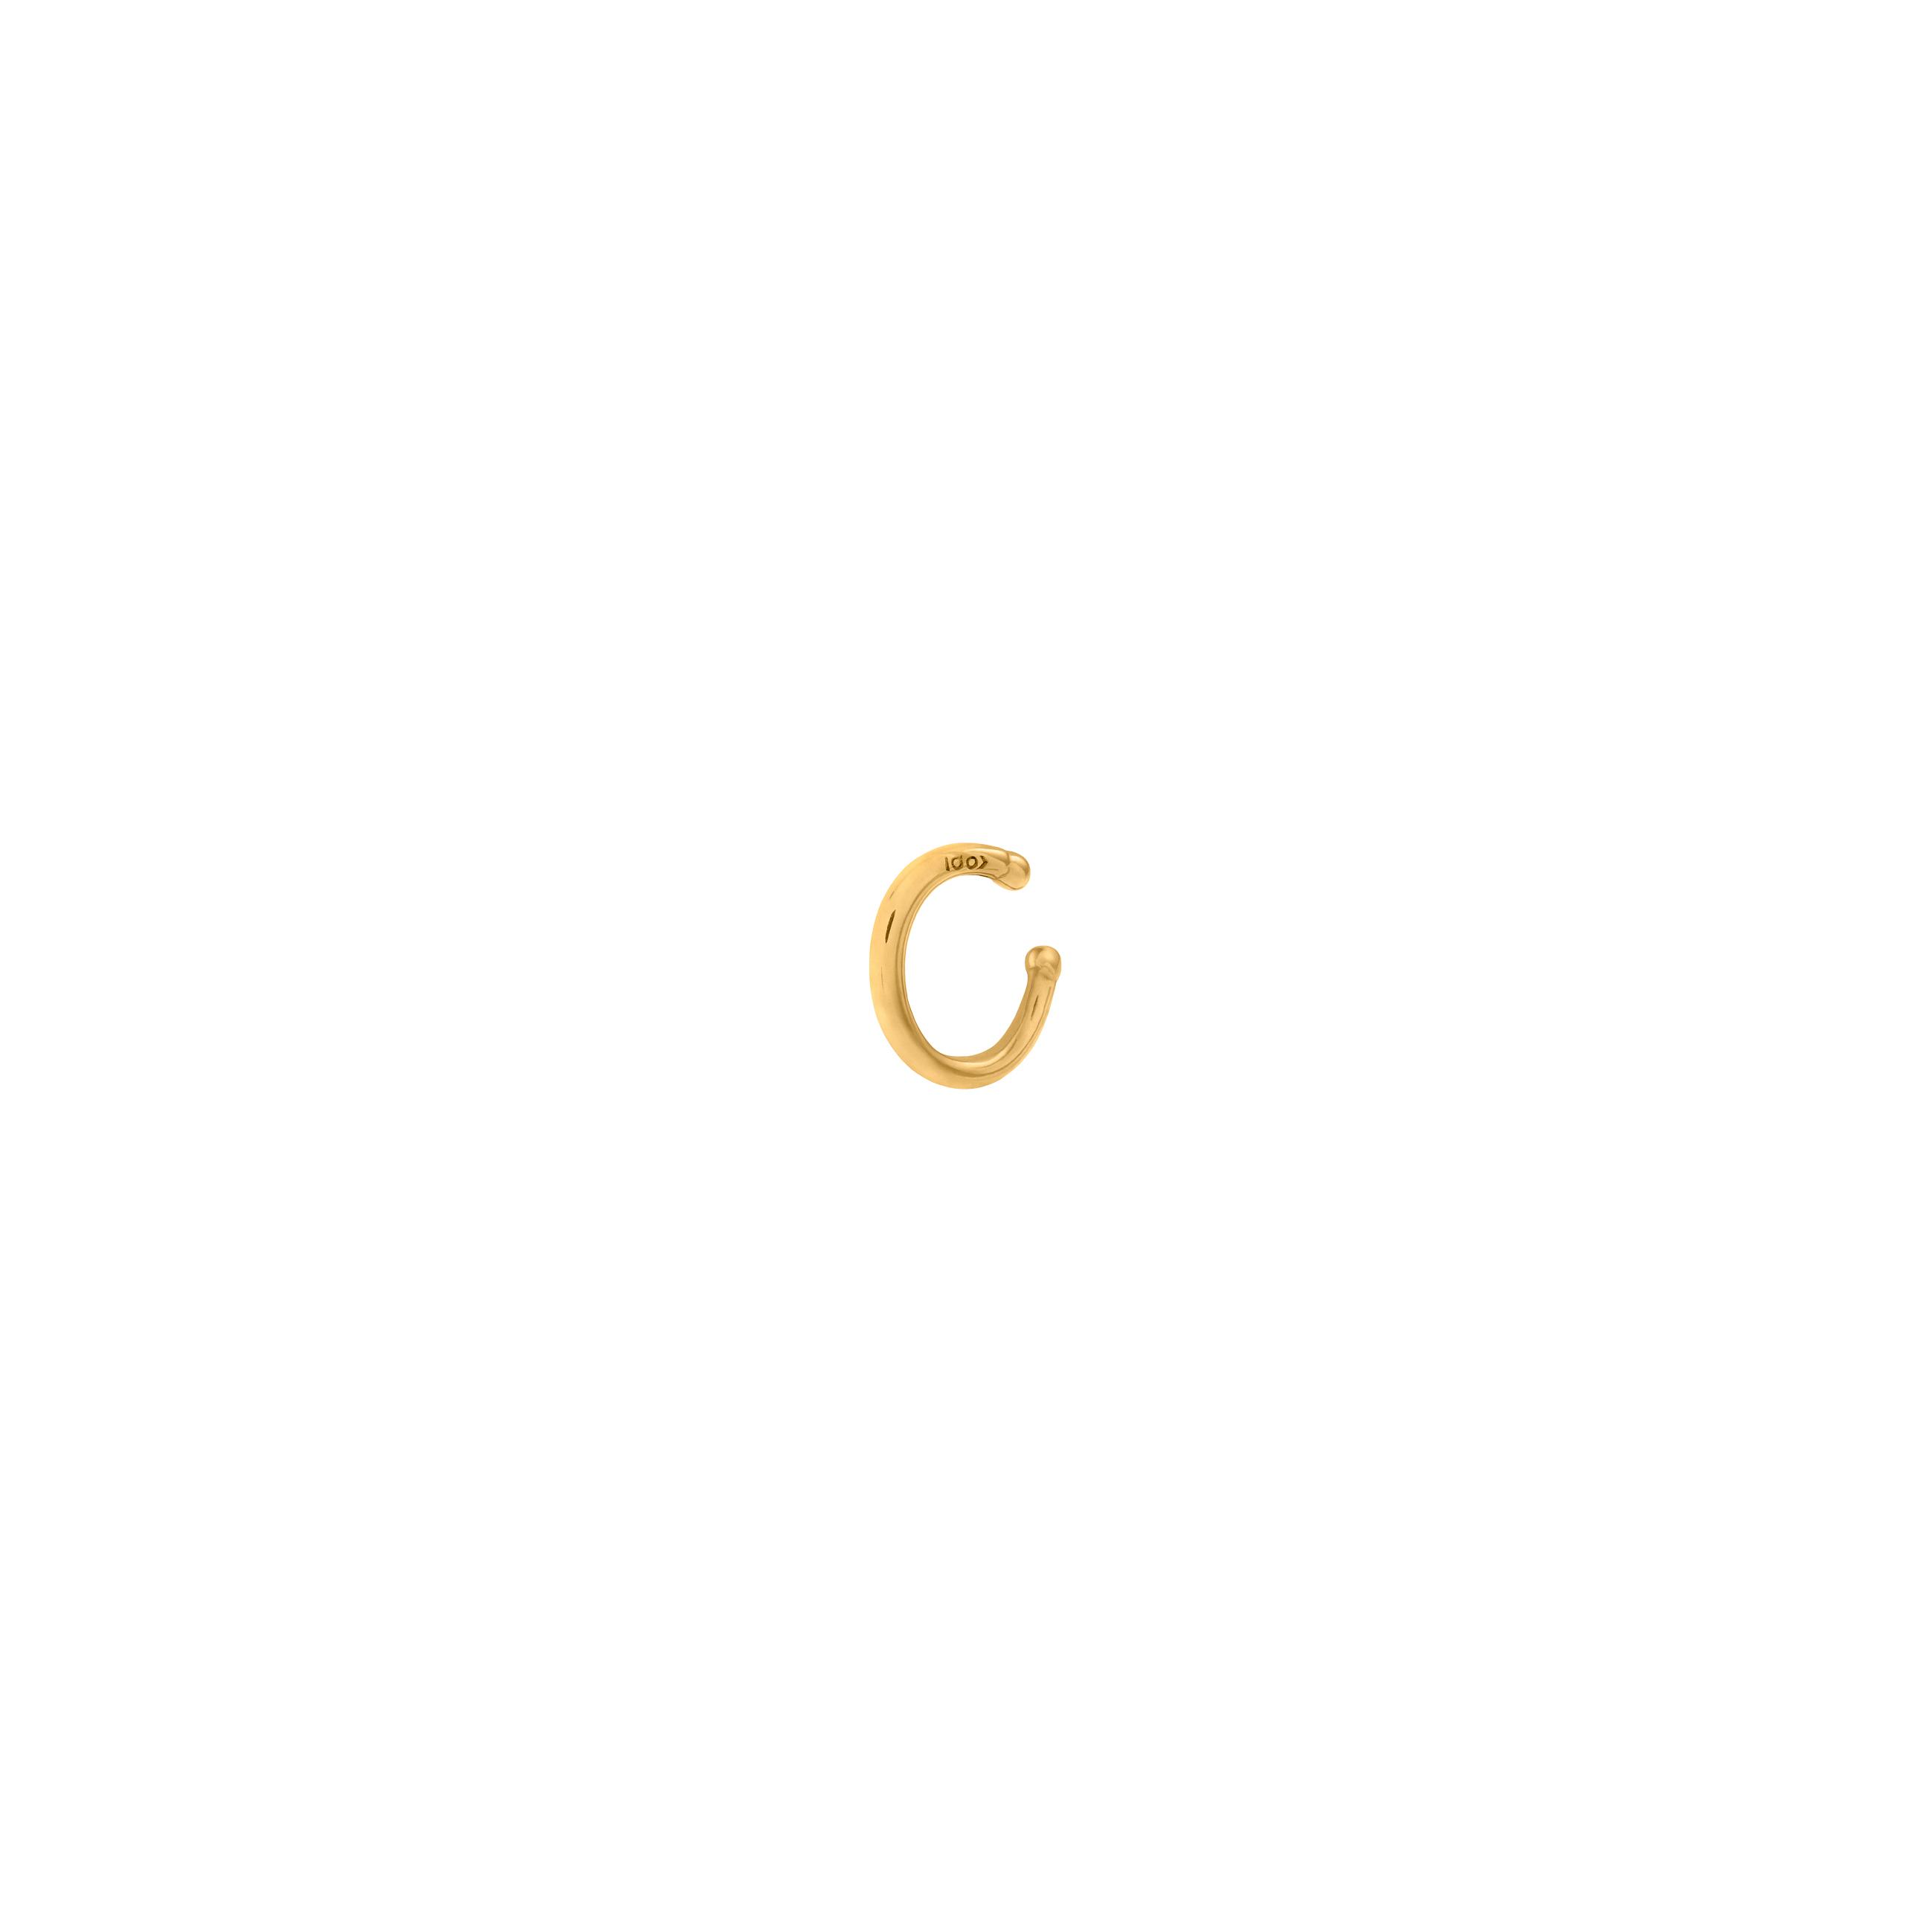 Nausznica Simple Gold